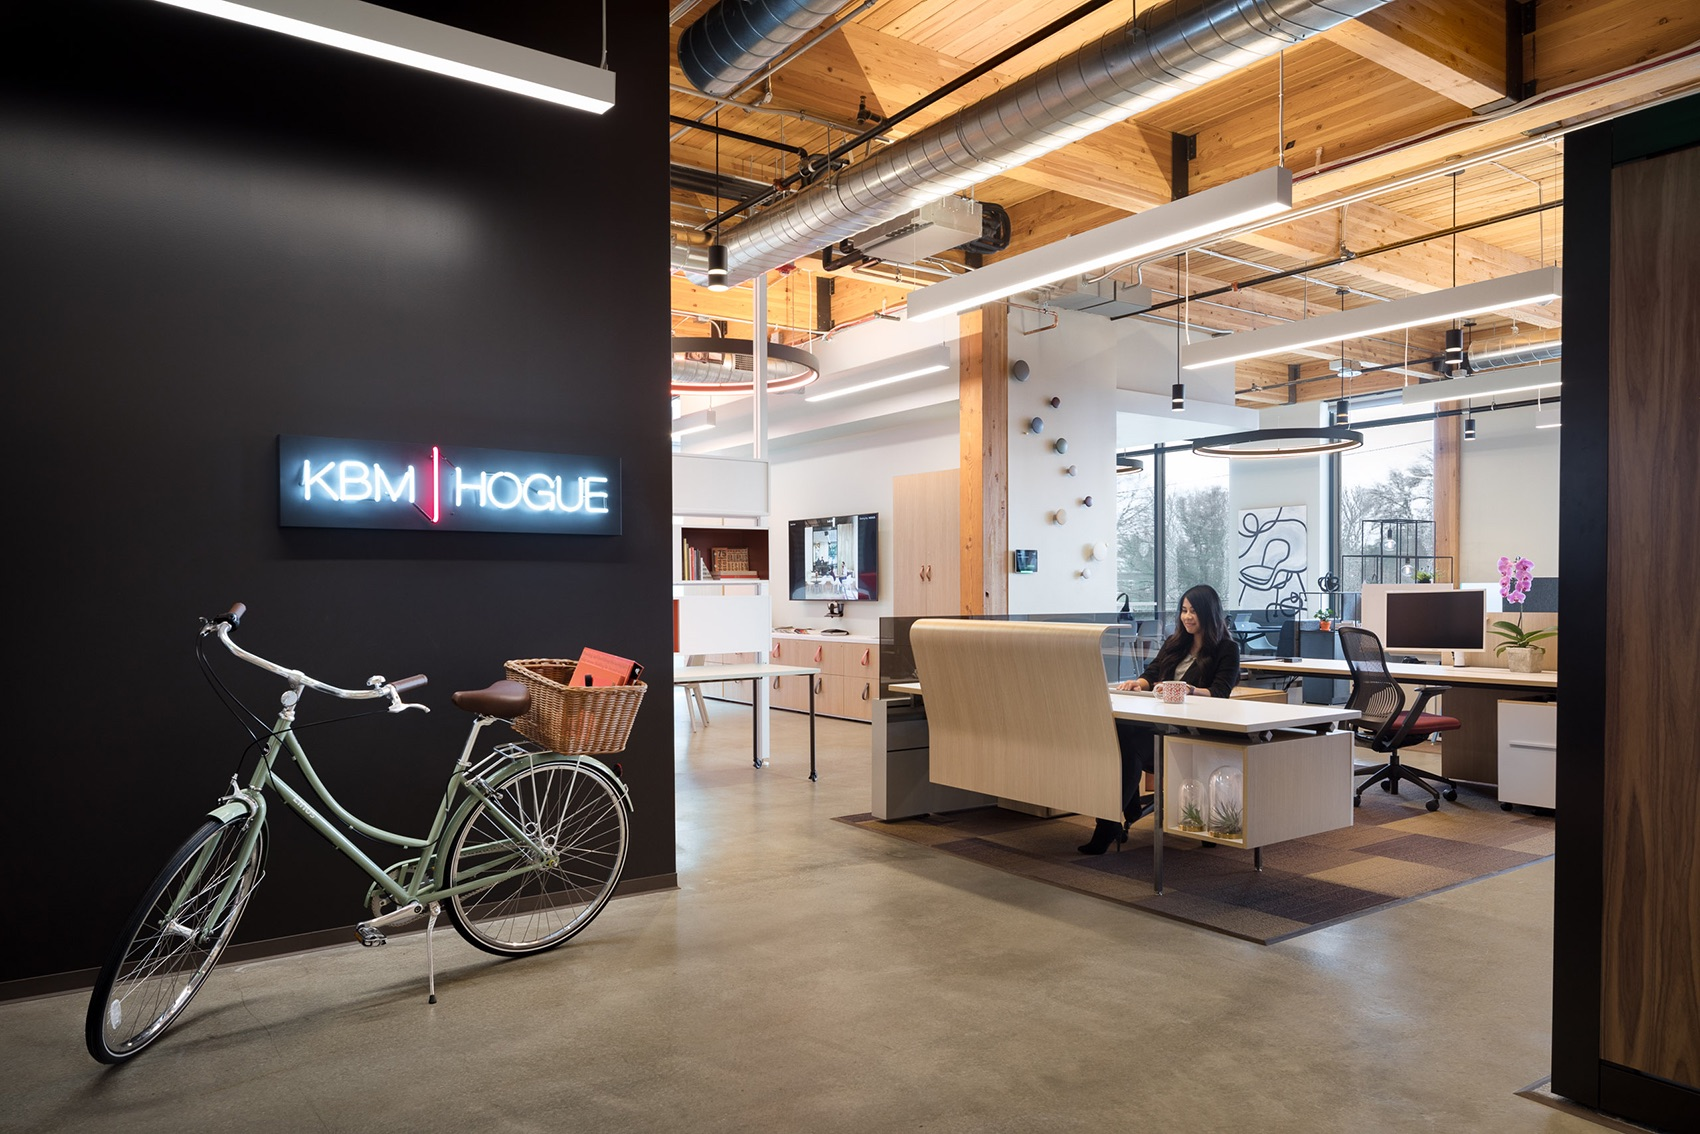 kbm-hoque-office-4